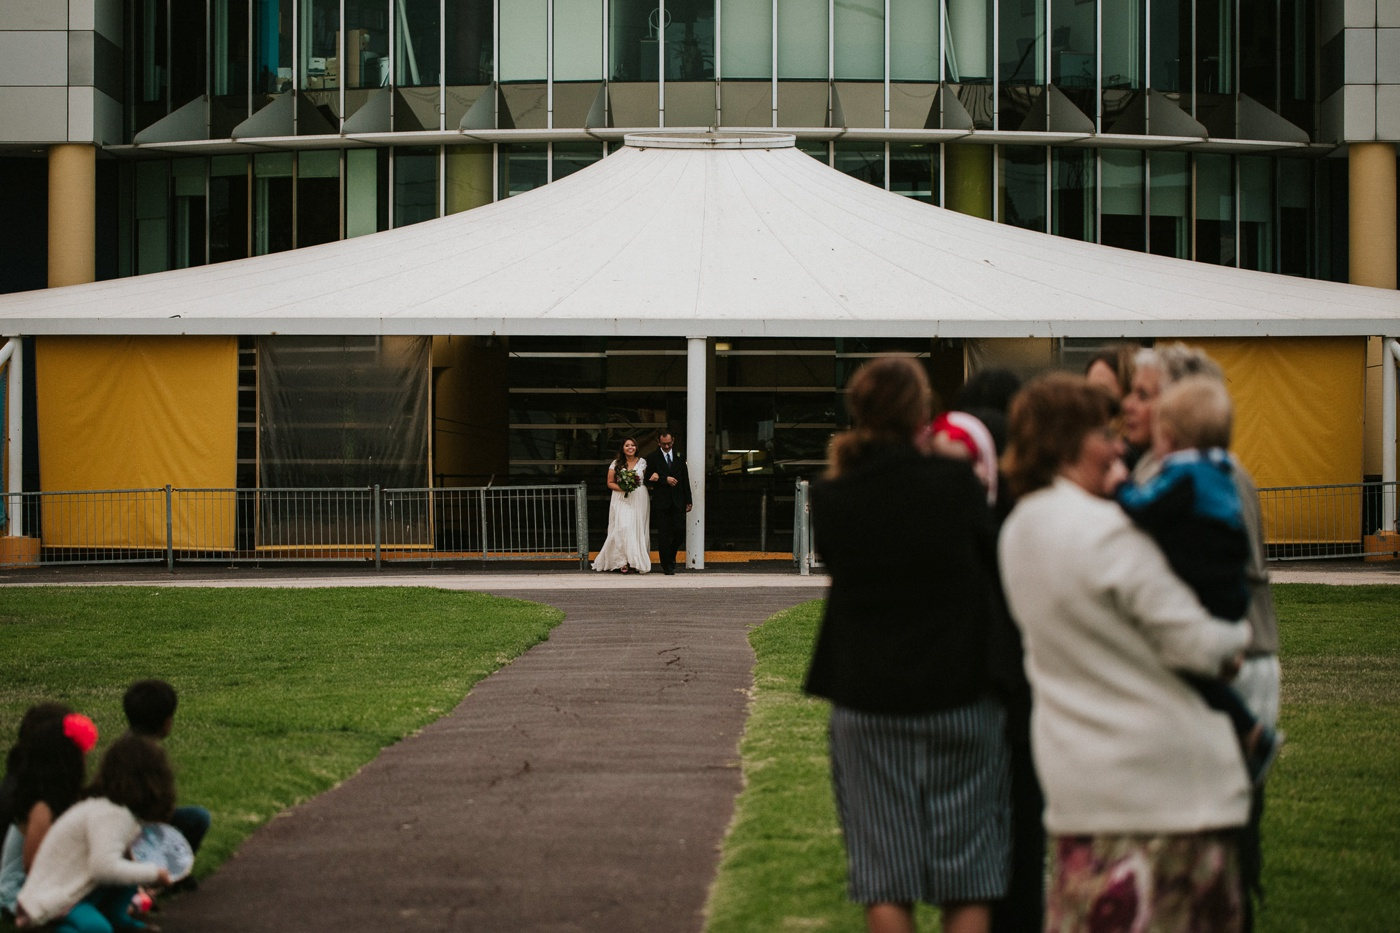 anitadaniel_melbourne-scienceworks-relaxed-fun-geek-wedding_melbourne-candid-wedding-photography_37